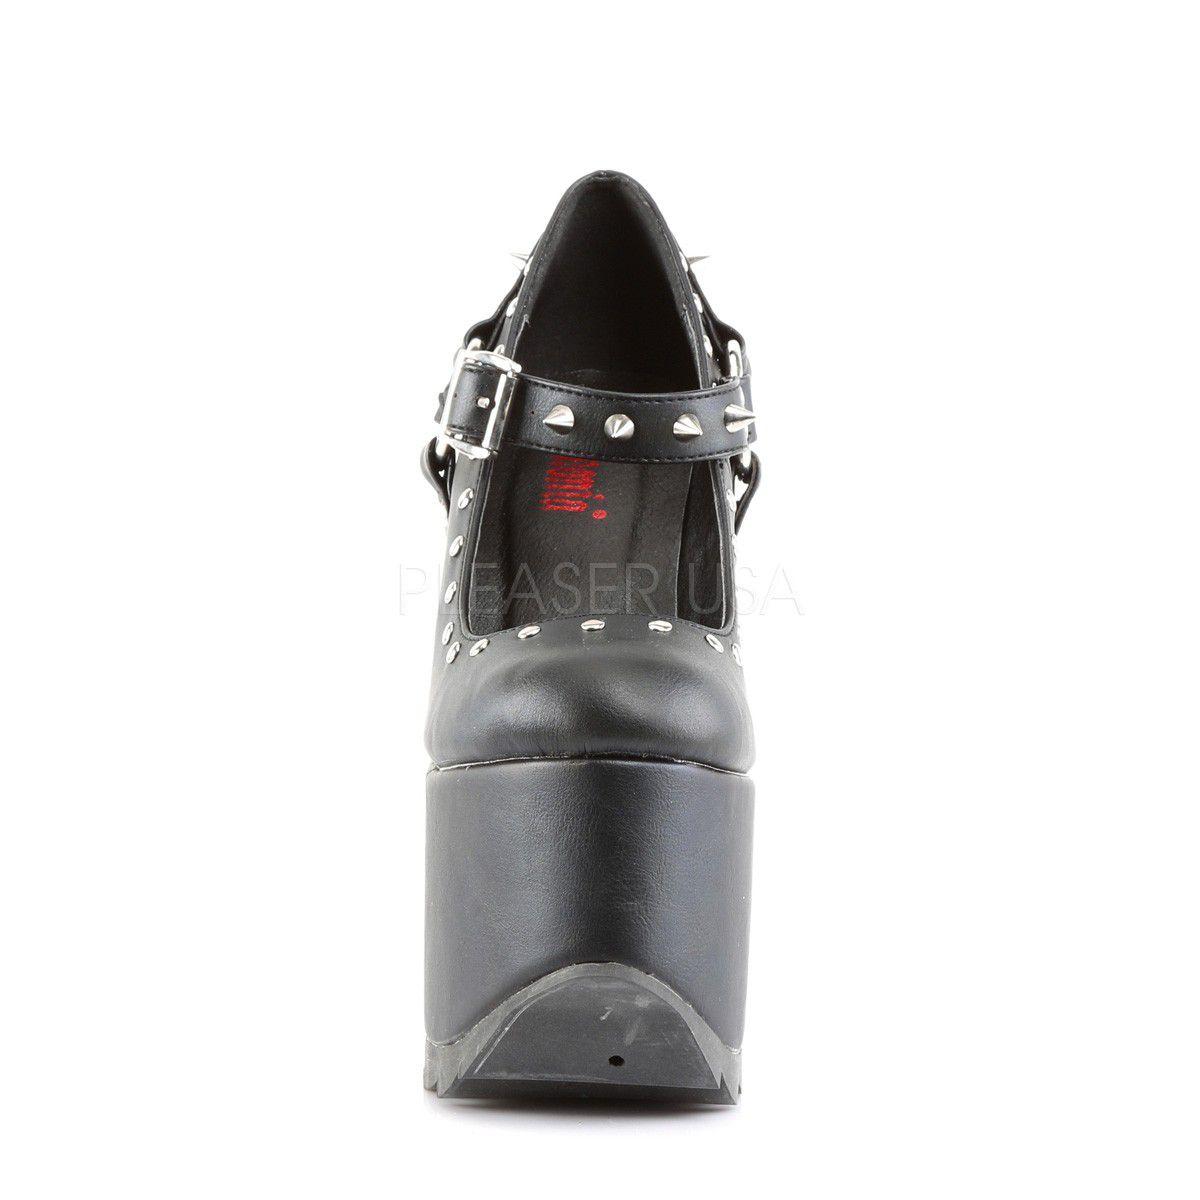 Sapato Cramps 02 - Demonia (encomenda)